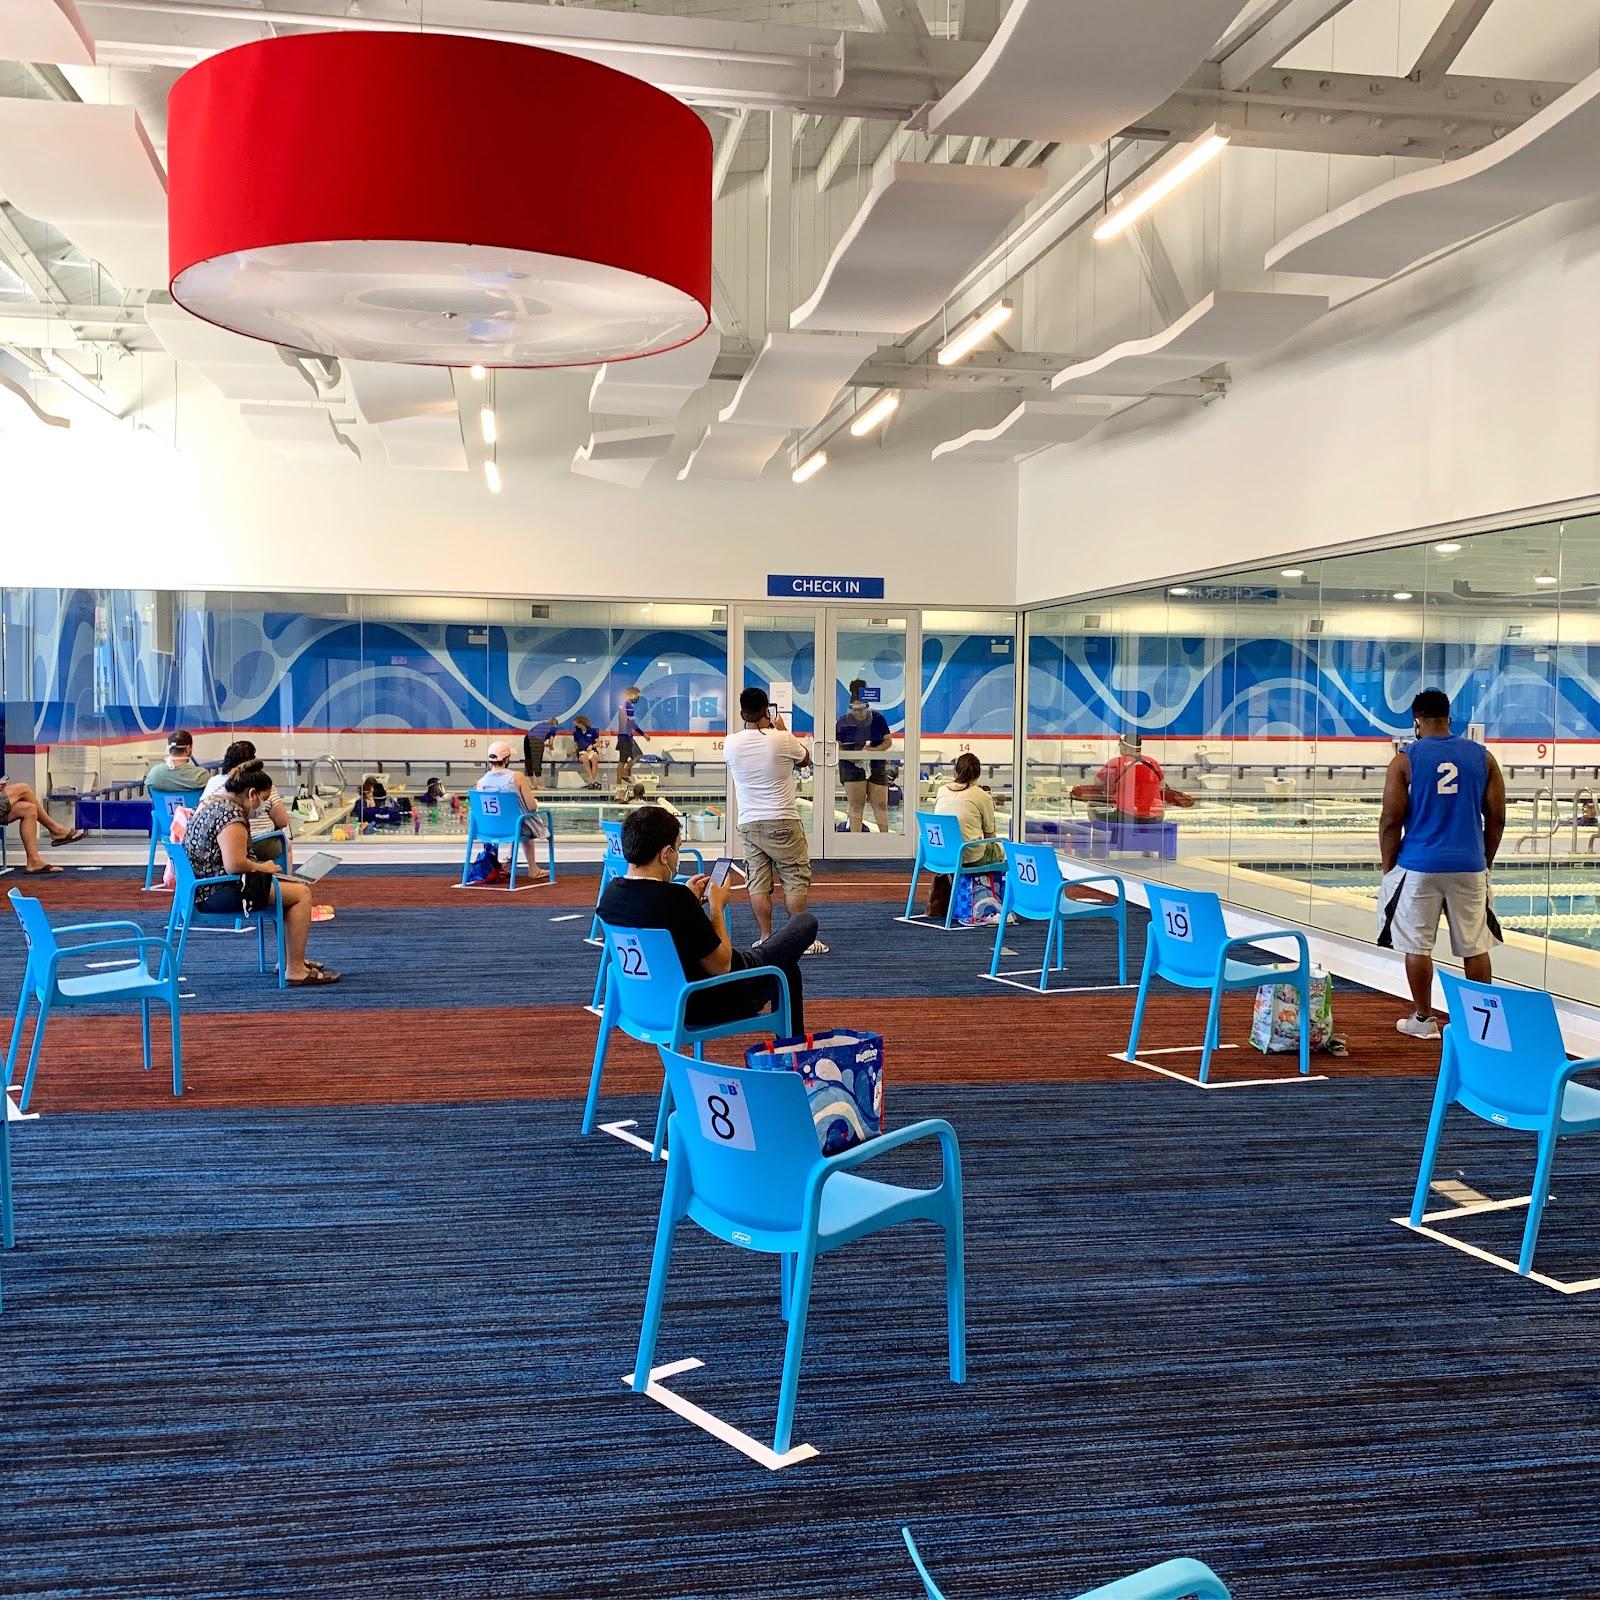 Social Distancing in the Big Blue Swim School waiting area